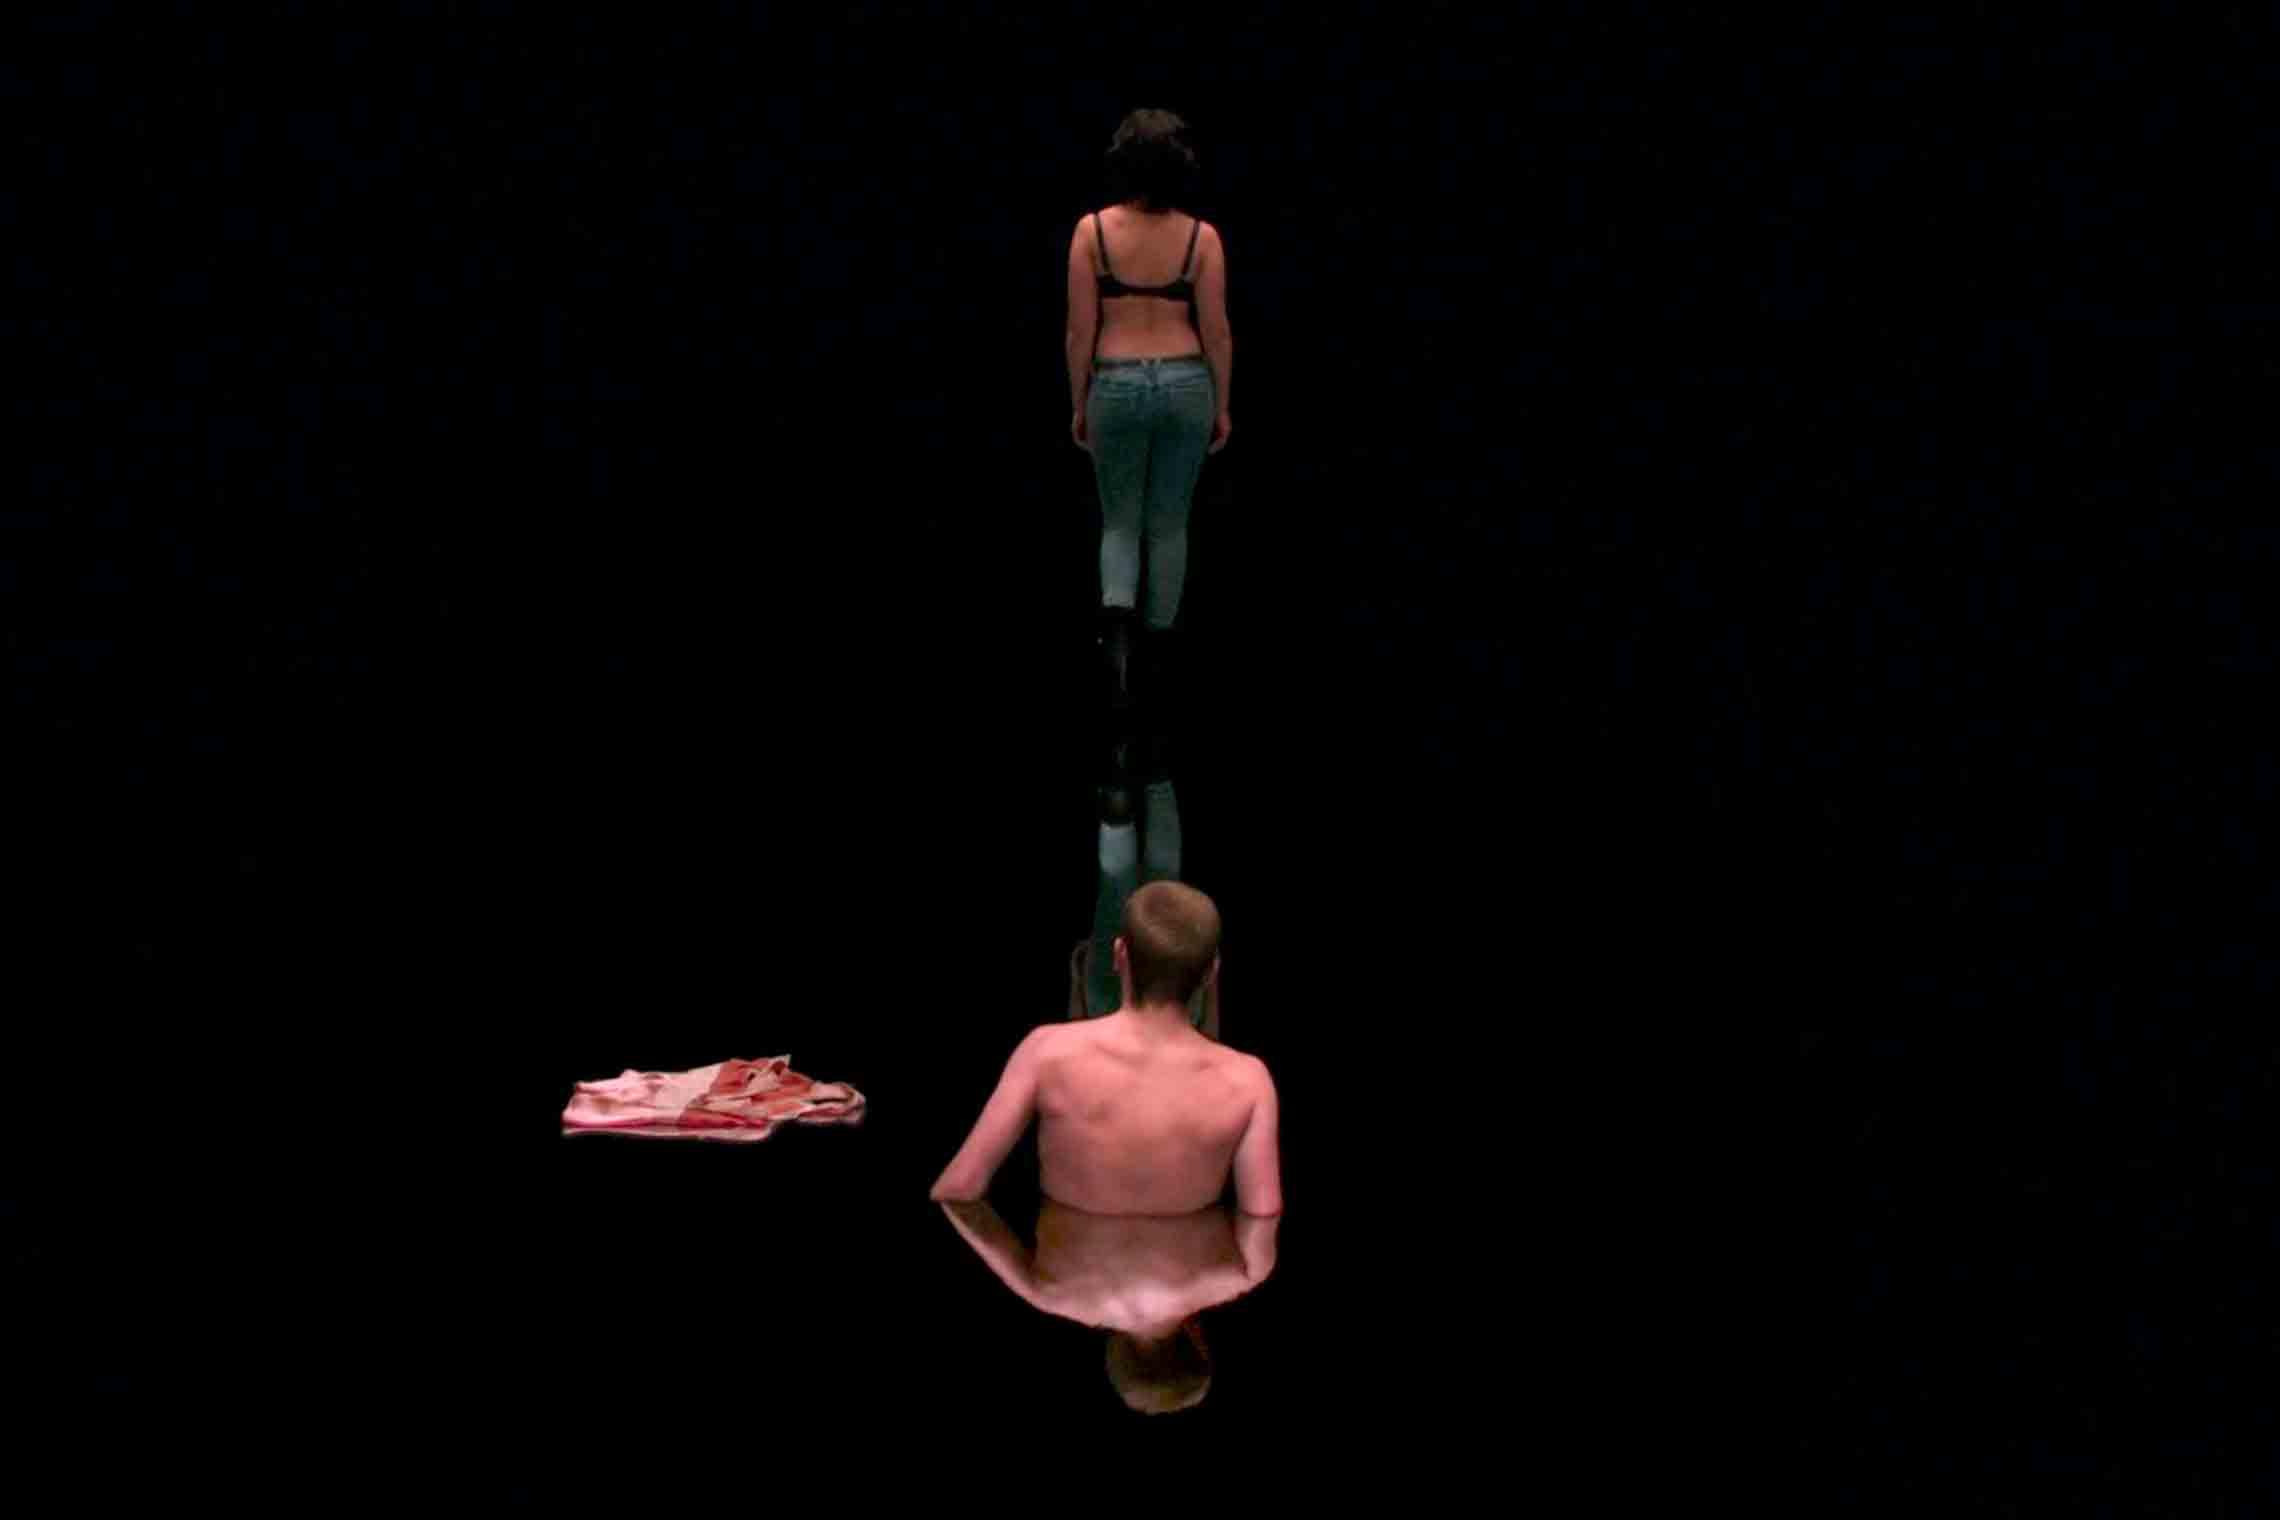 Scarlet Johanson's character walking across her black goo body in Under The Skin (2014)